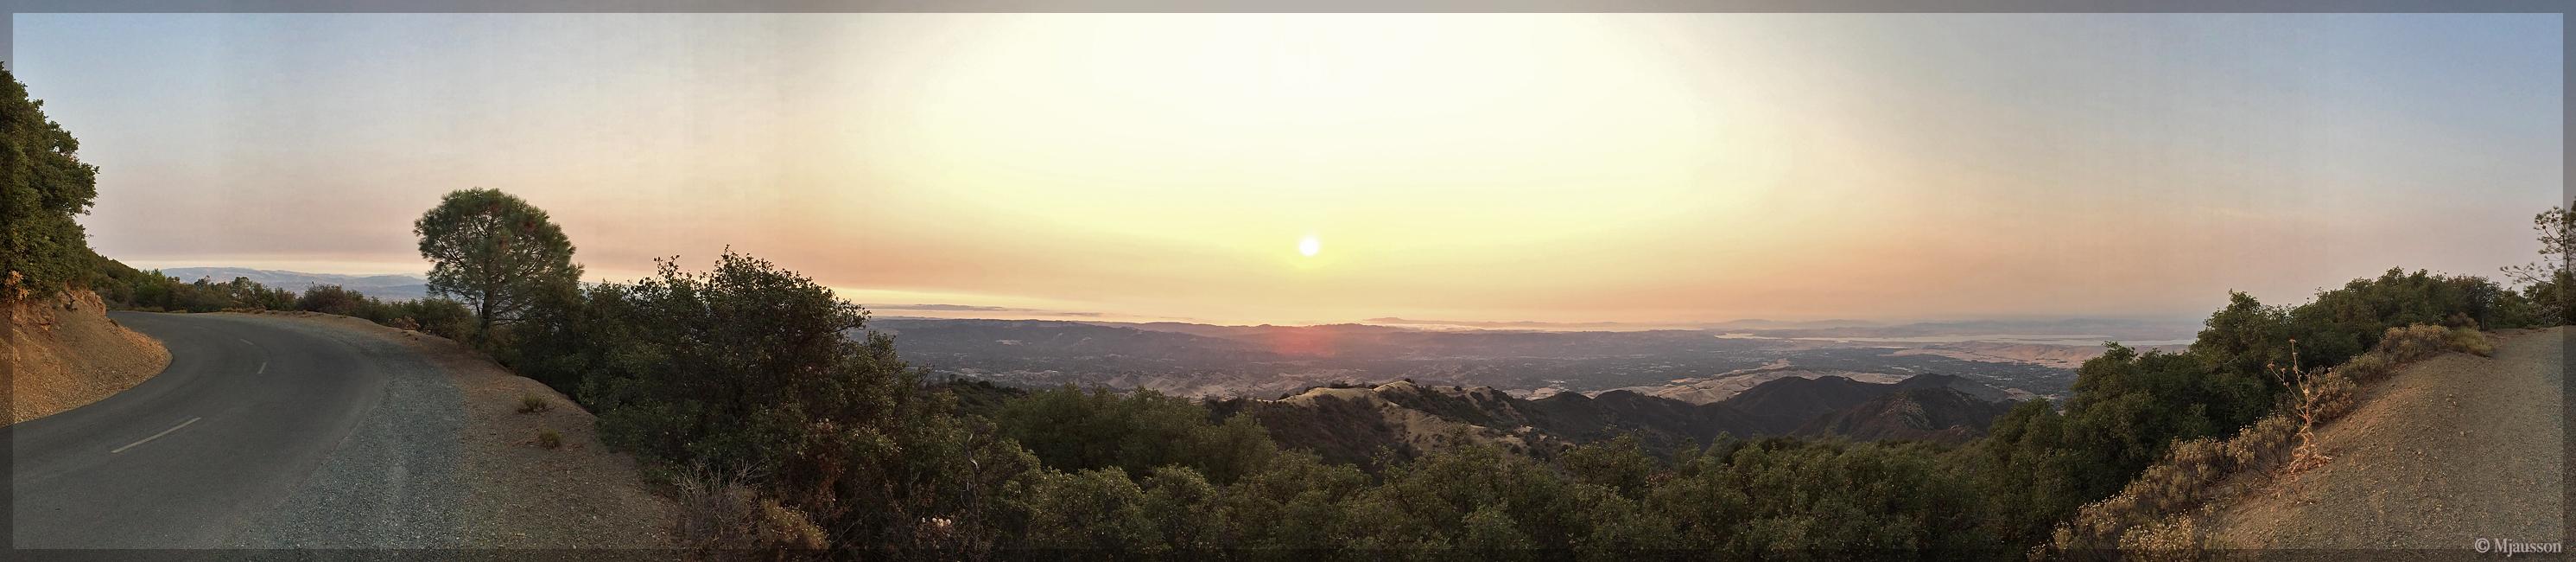 Sunset at Diablo Valley Overlook